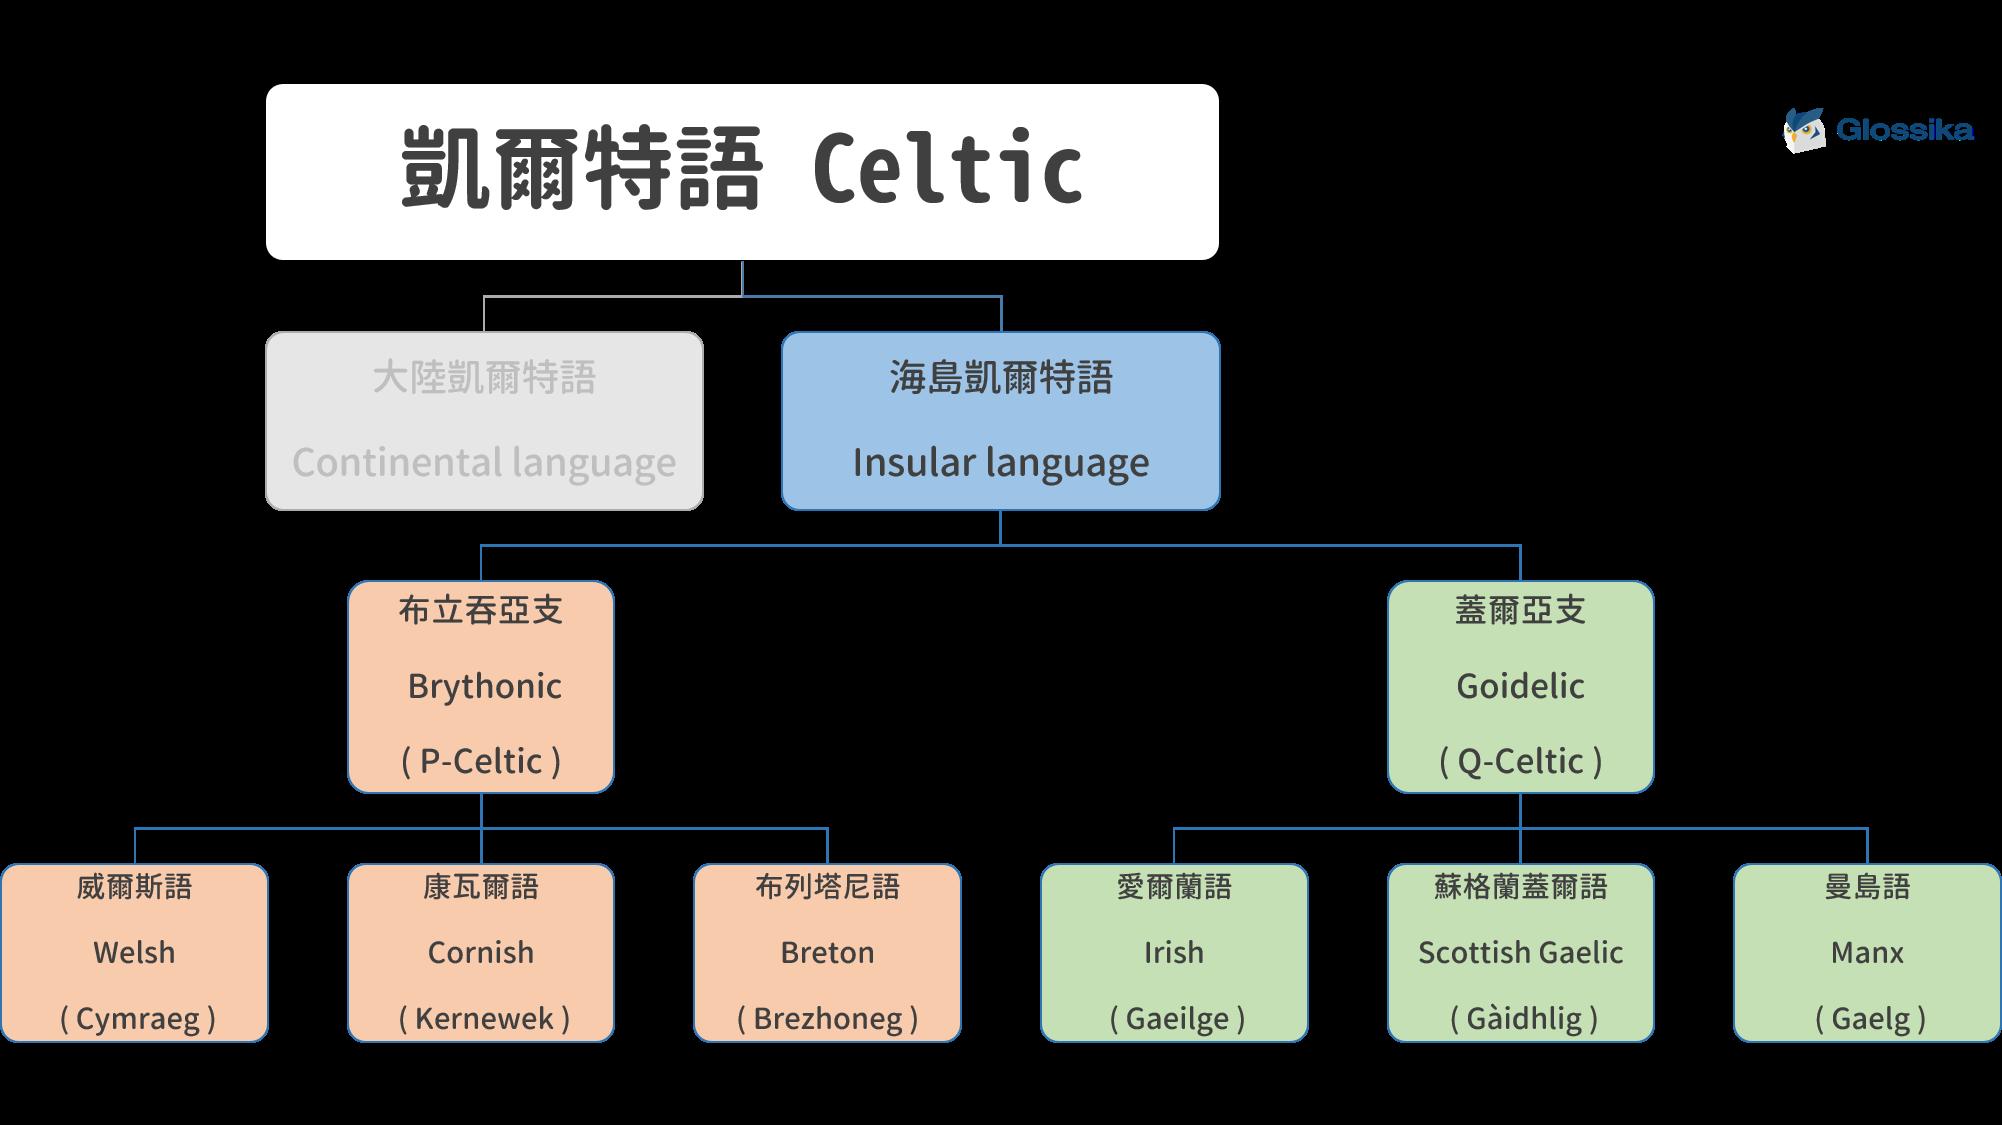 celtic-branch-3